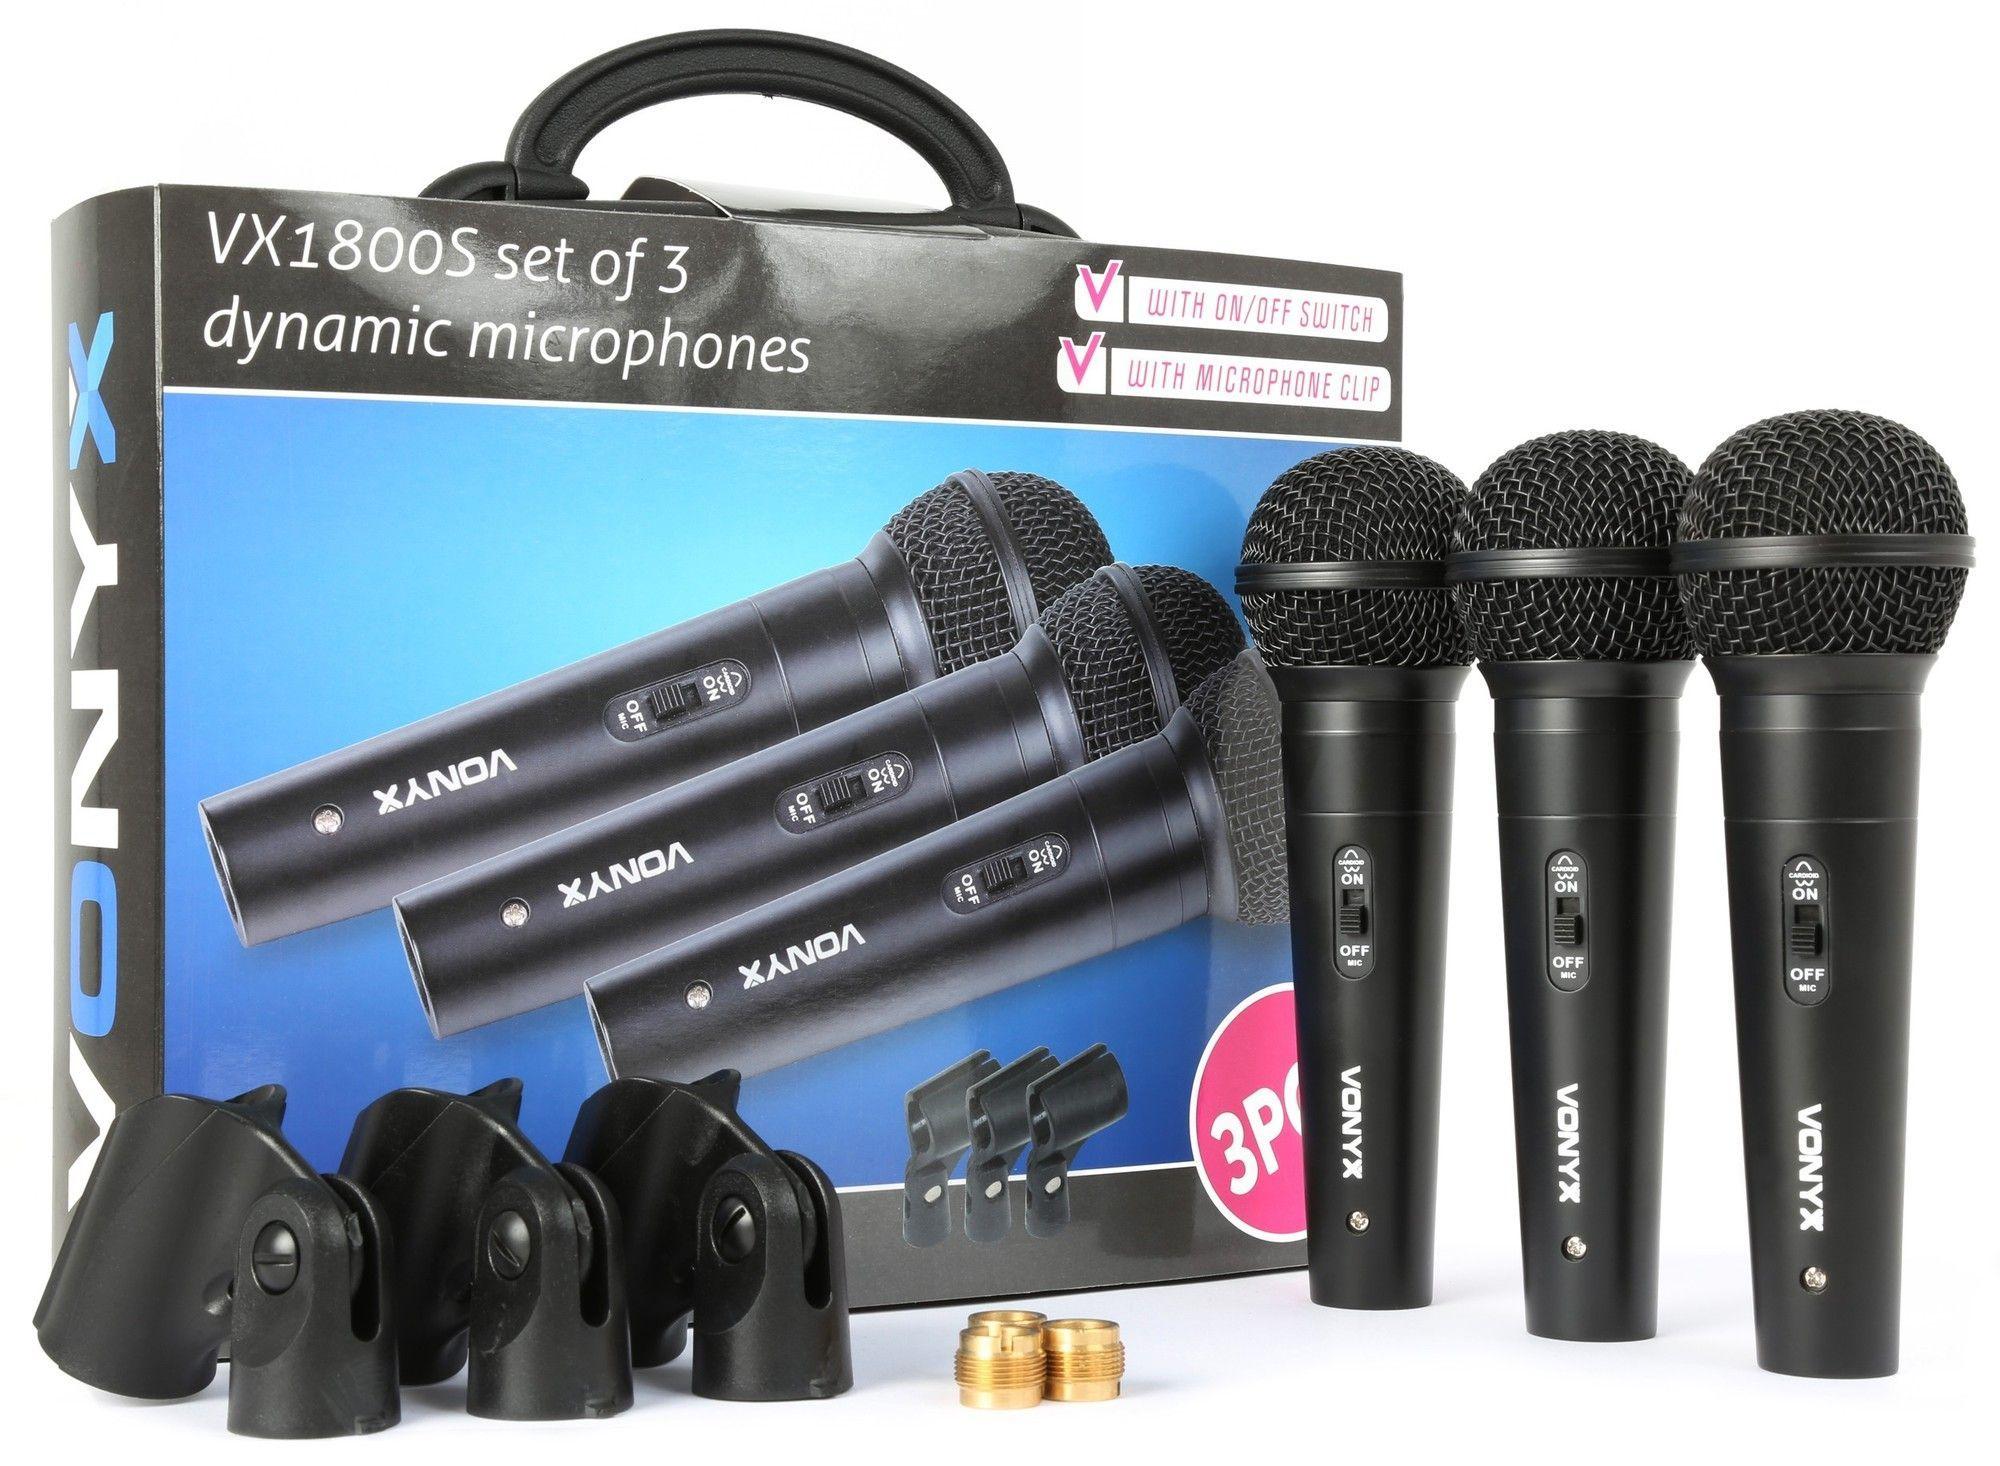 Vonyx VX1800S Dynamische microfoonset van 3 microfoons